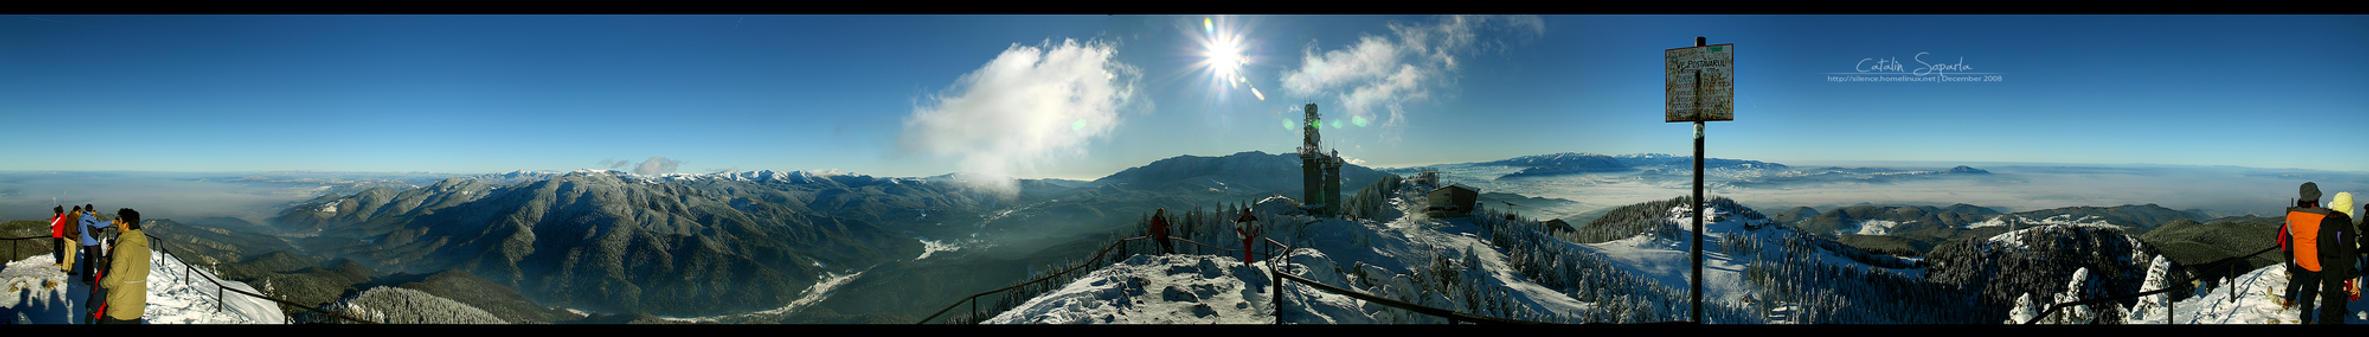 Panorama Postavaru - 360 by vxside